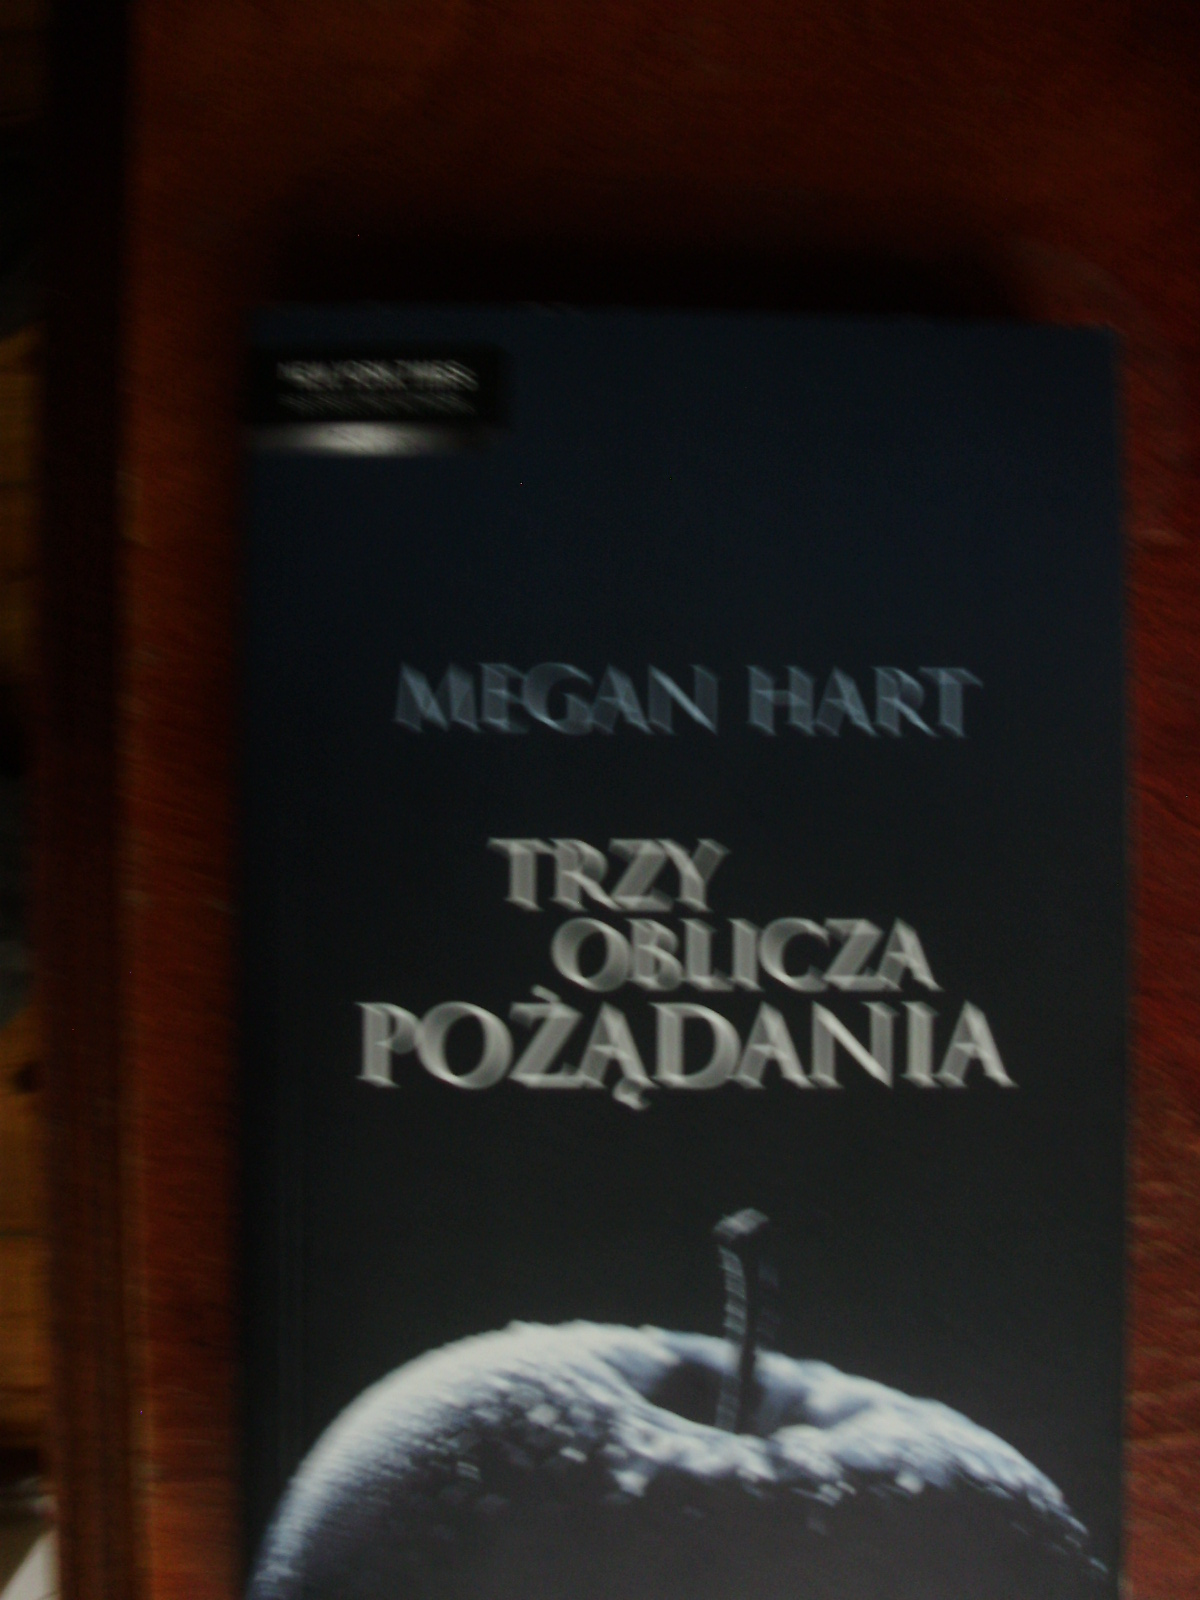 Megan Hart Trzy oblicza pozadania